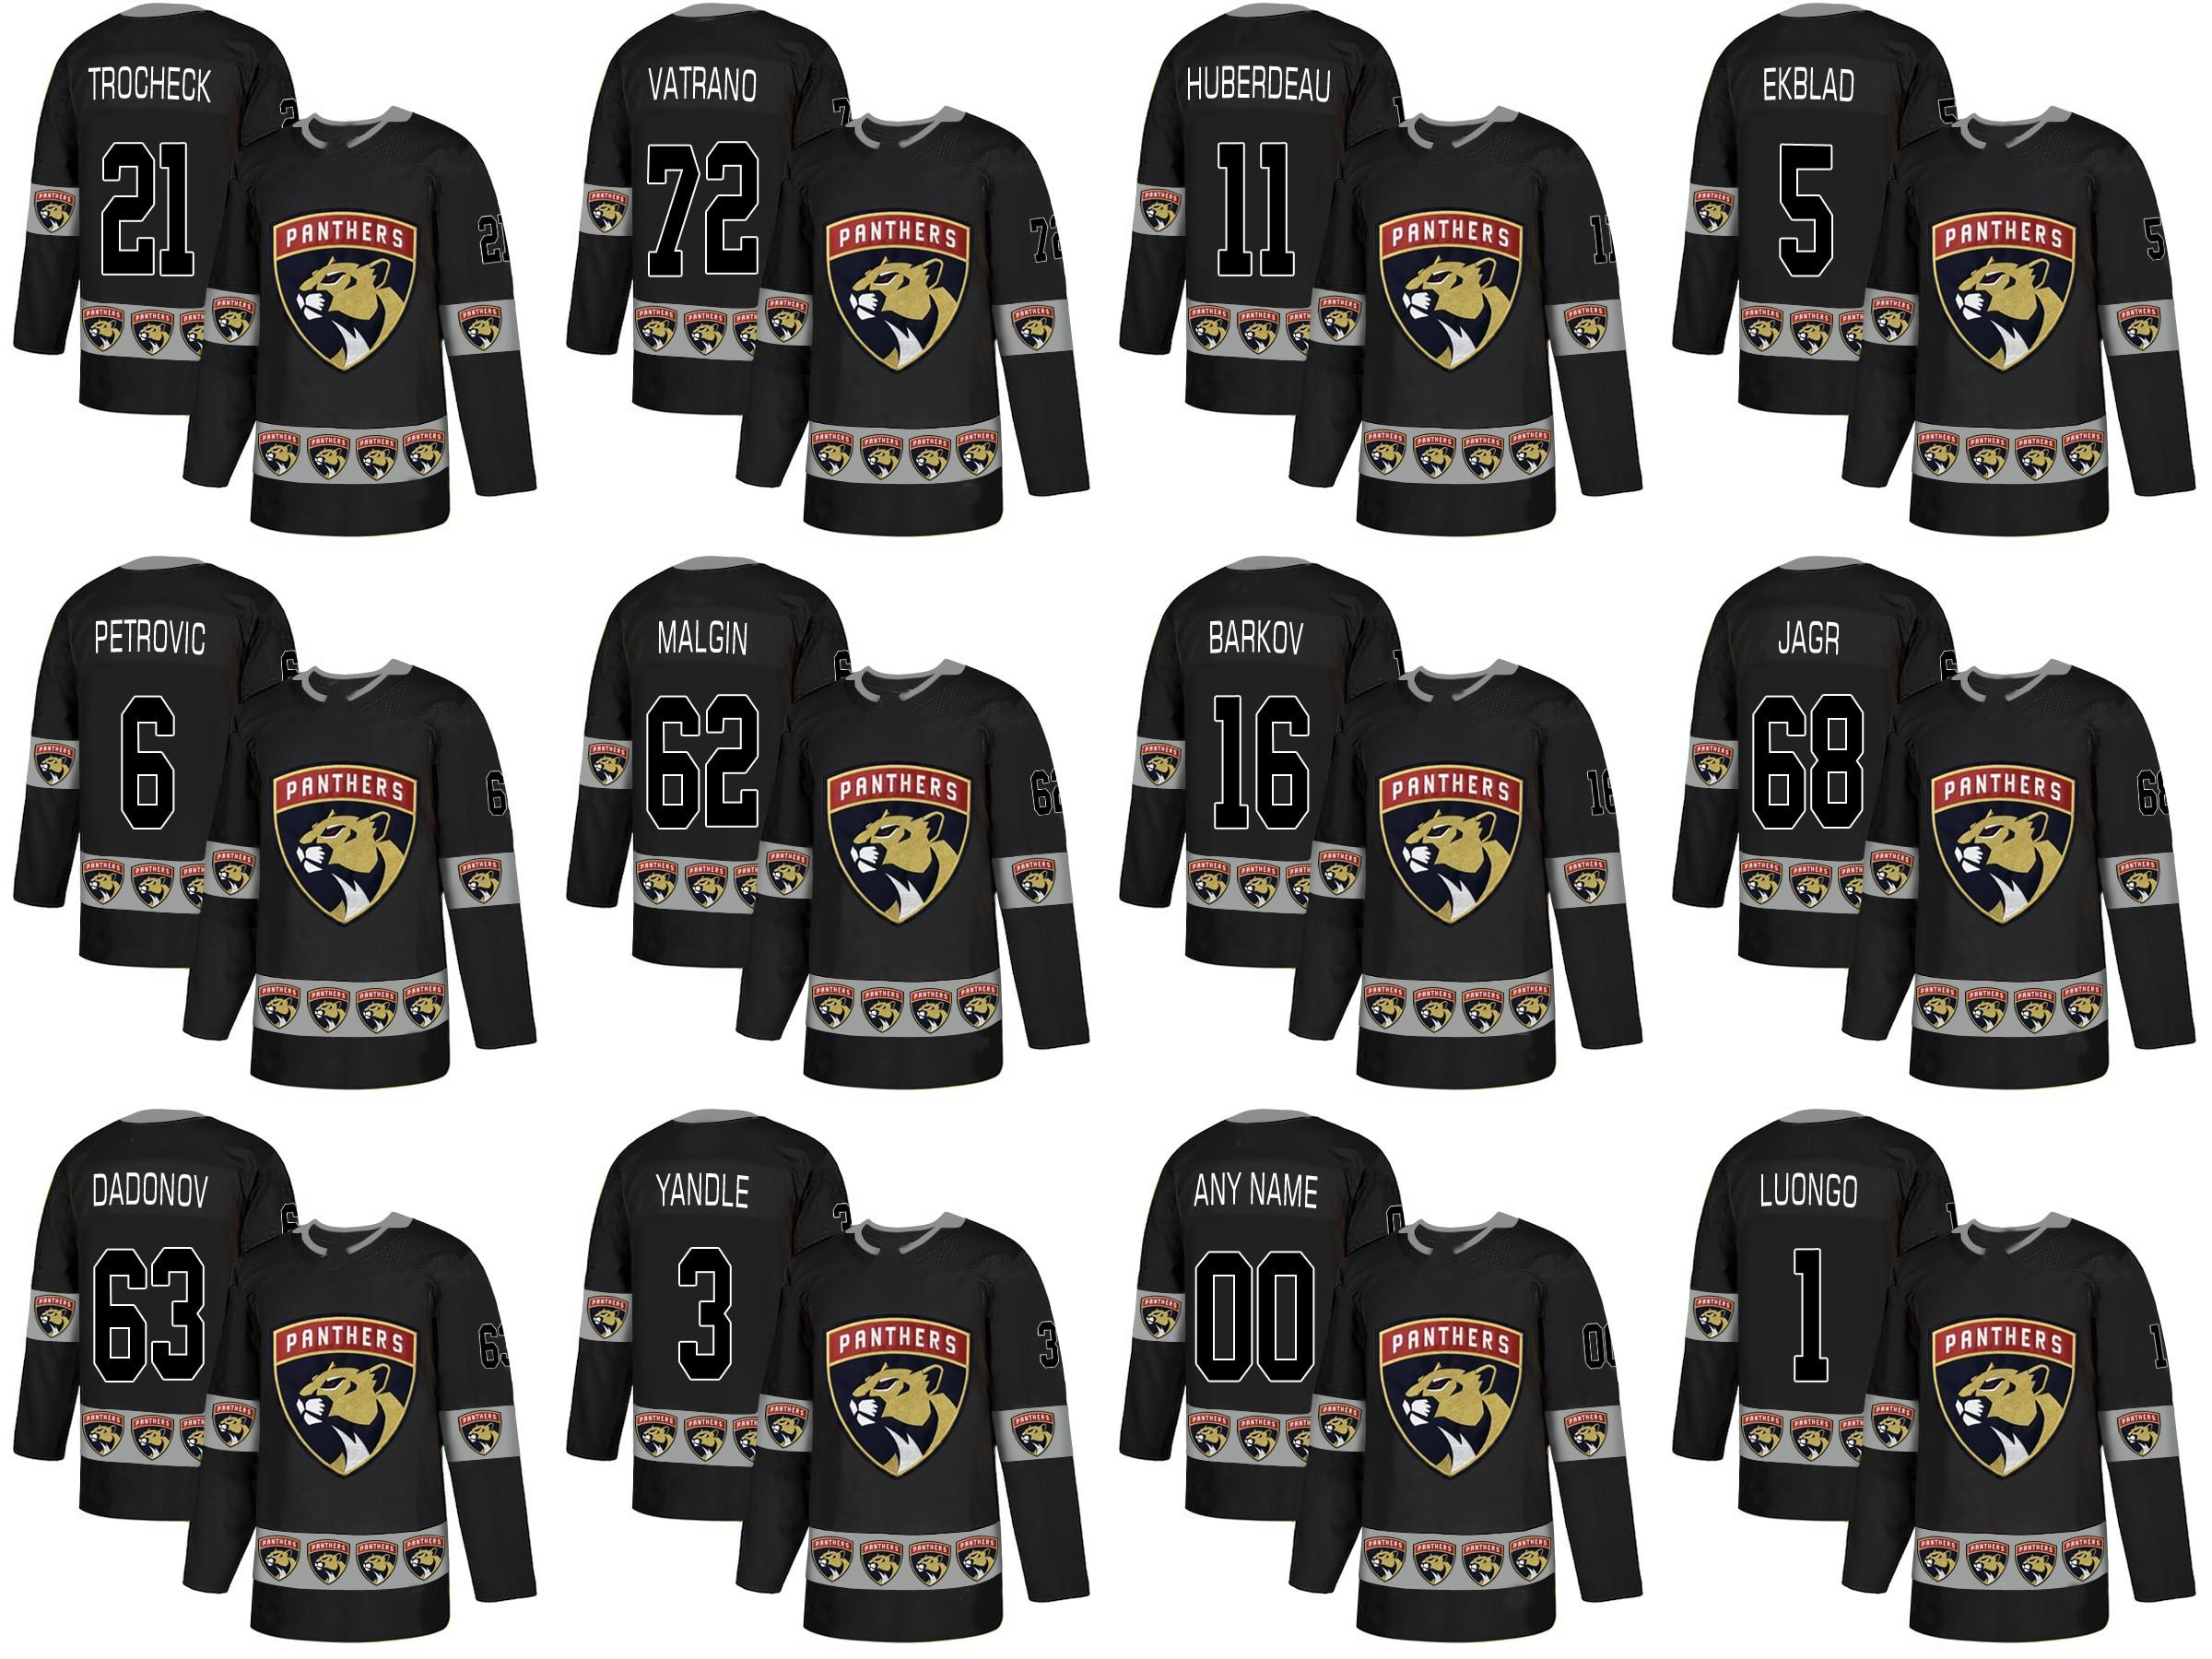 e99be6ef6 Florida Panthers Aaron Ekblad Aleksander Barkov Vincent Trocheck Roberto  Luongo Mark Pysyk Denis Malgin Fashion Team Logos Hockey Jerseys Hockey  Jerseys ...